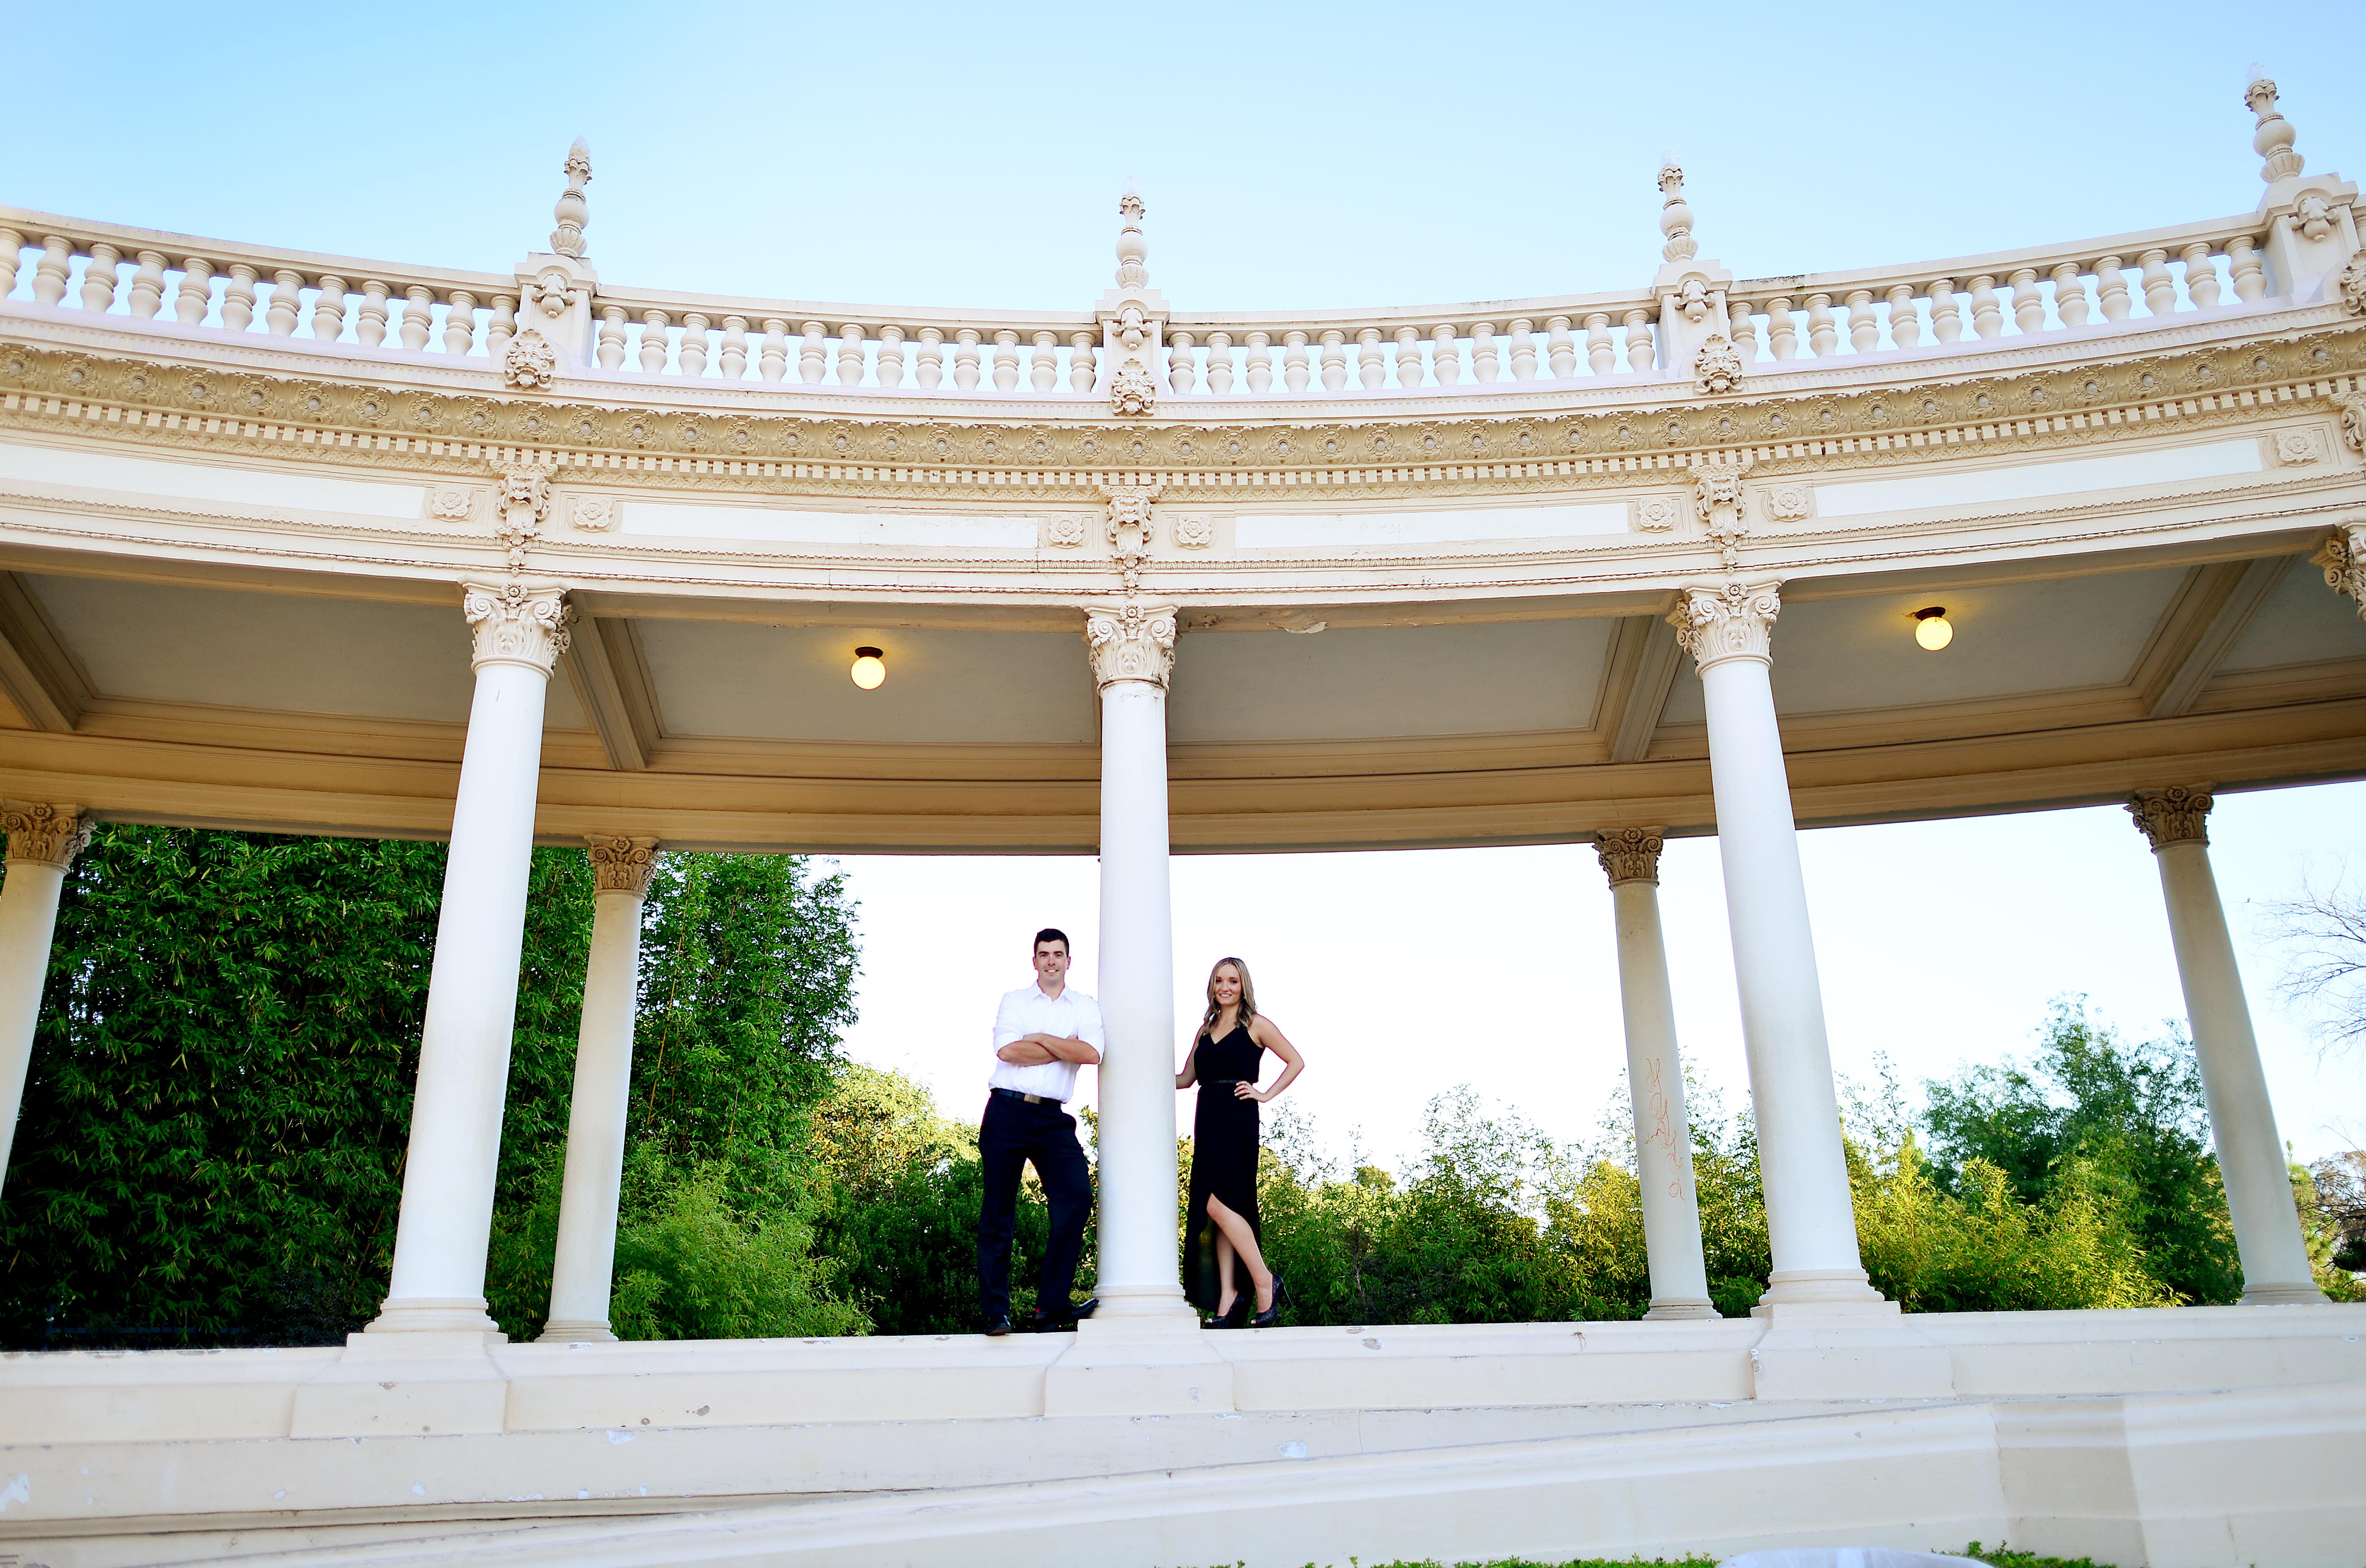 la joll engagement, san diego engagement, couple's portraits. la joll asunset, engagement portraits, balboa park engagement